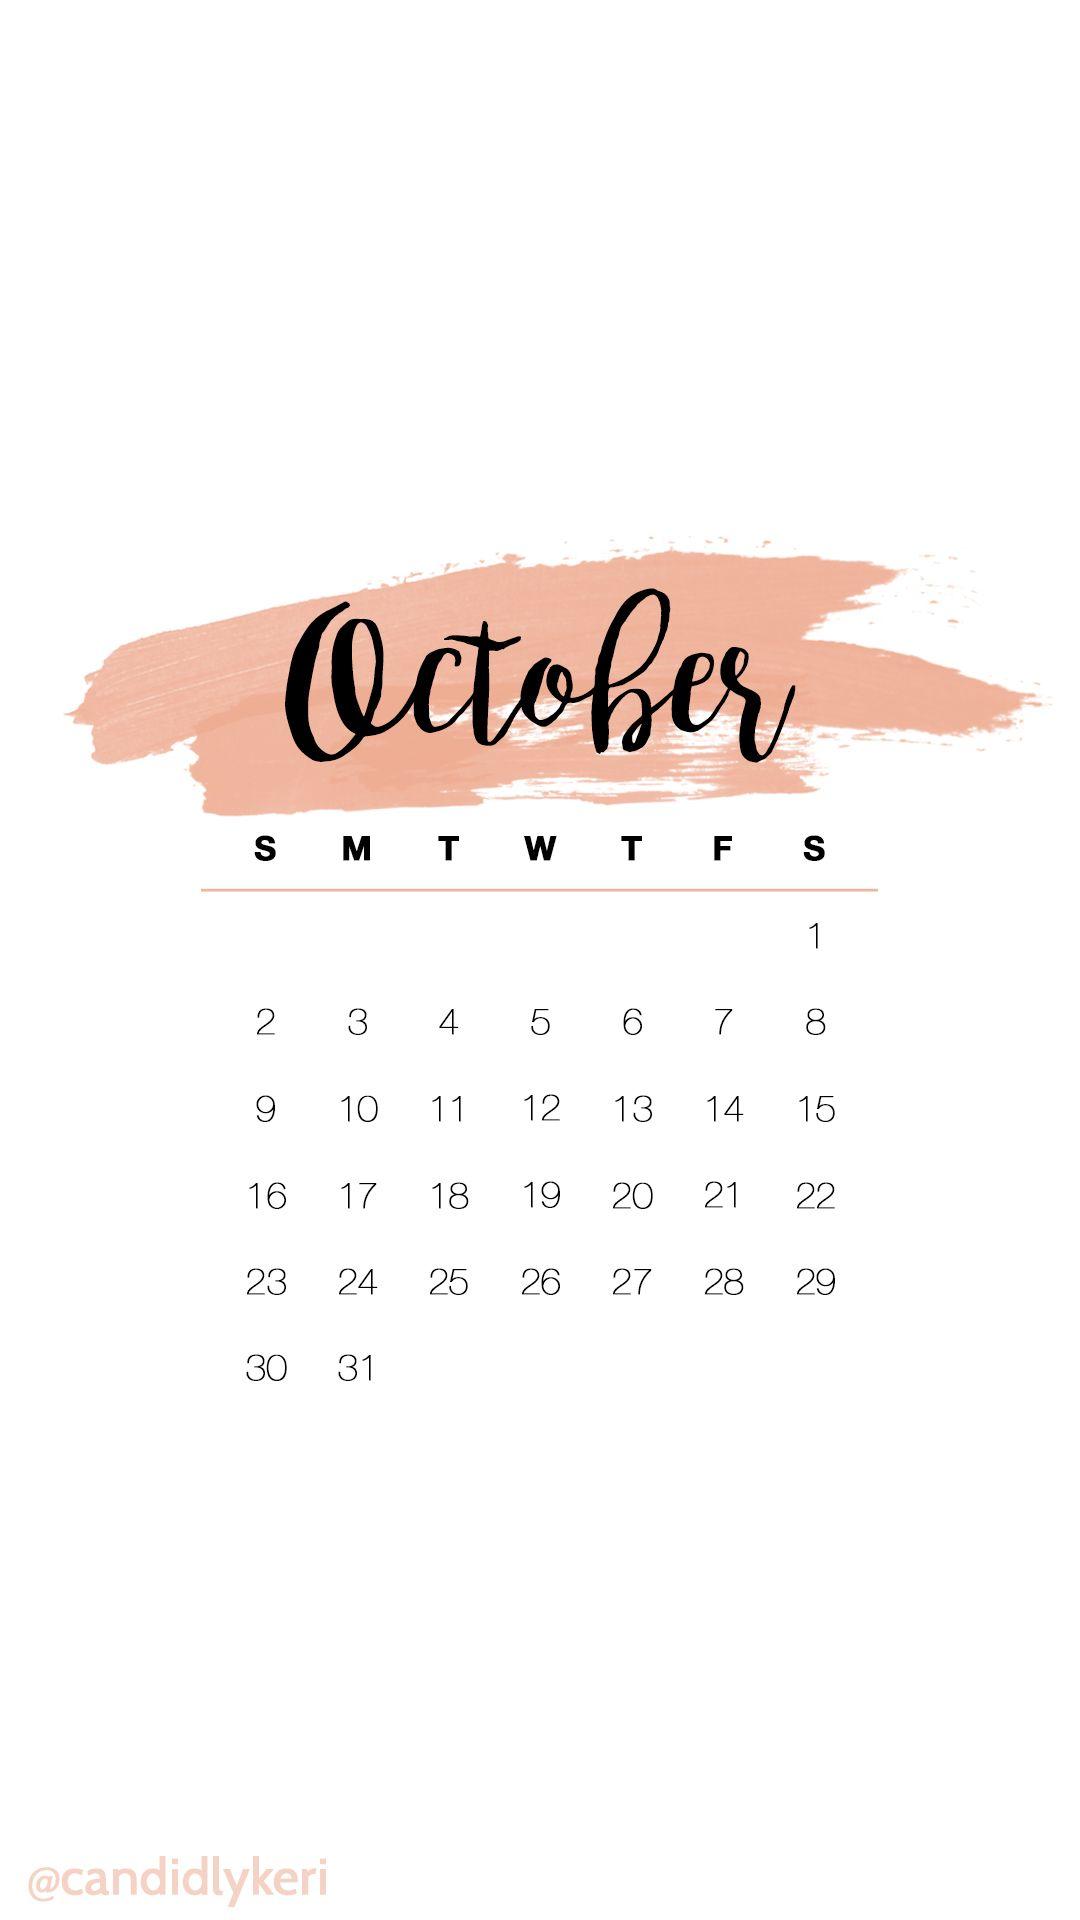 Mobile Candidly Keri October Calendar Calendar Wallpaper Pink Wallpaper Iphone